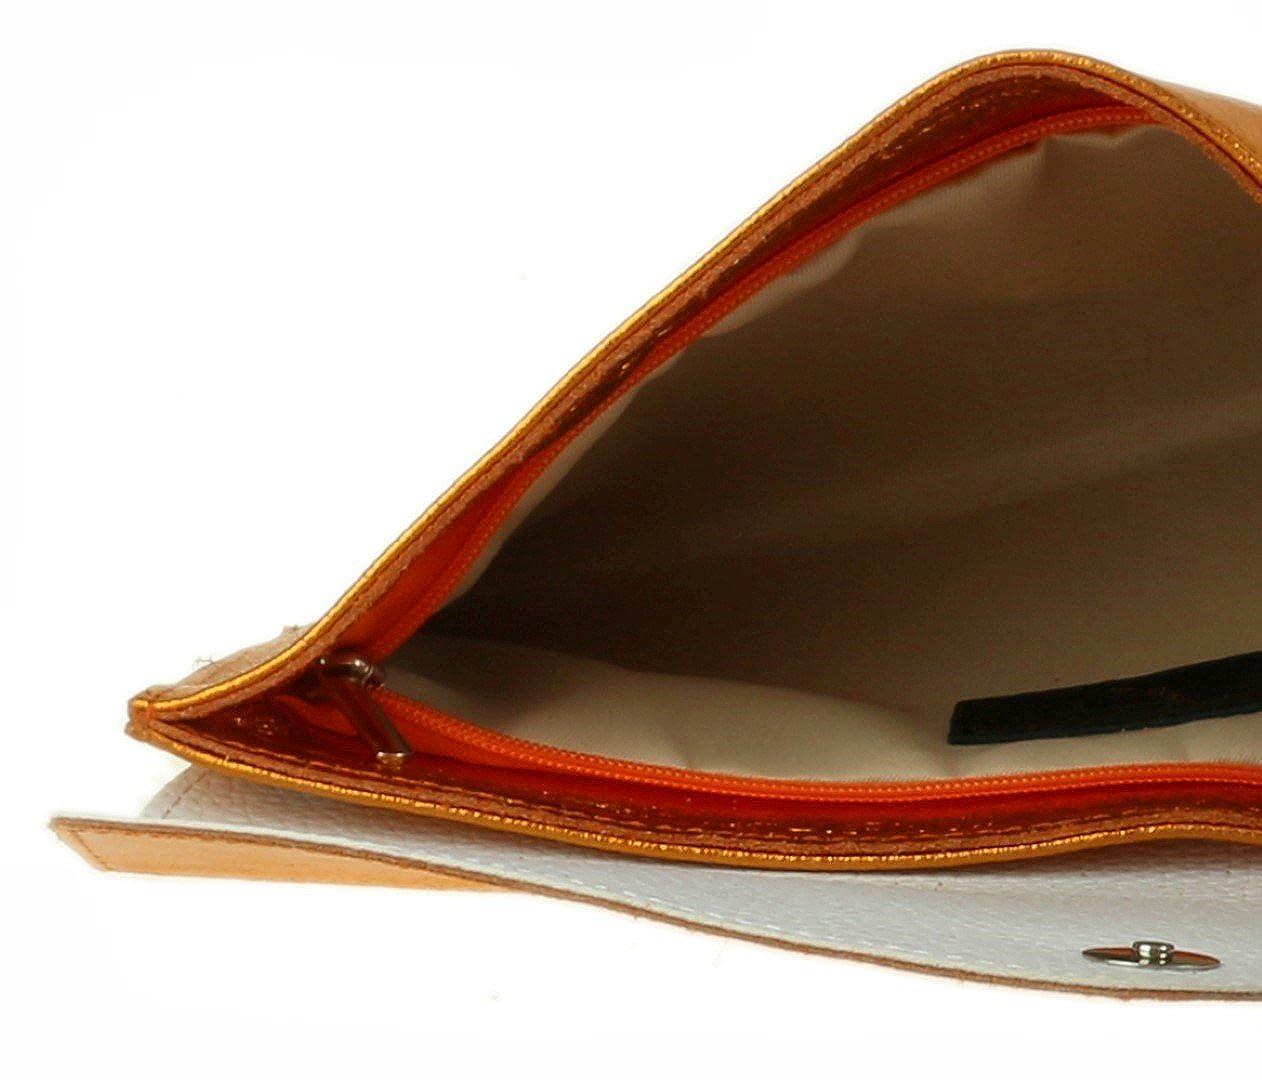 Girly HandBags Genuine Leather Italian Metallic Envelope Clutch Bag